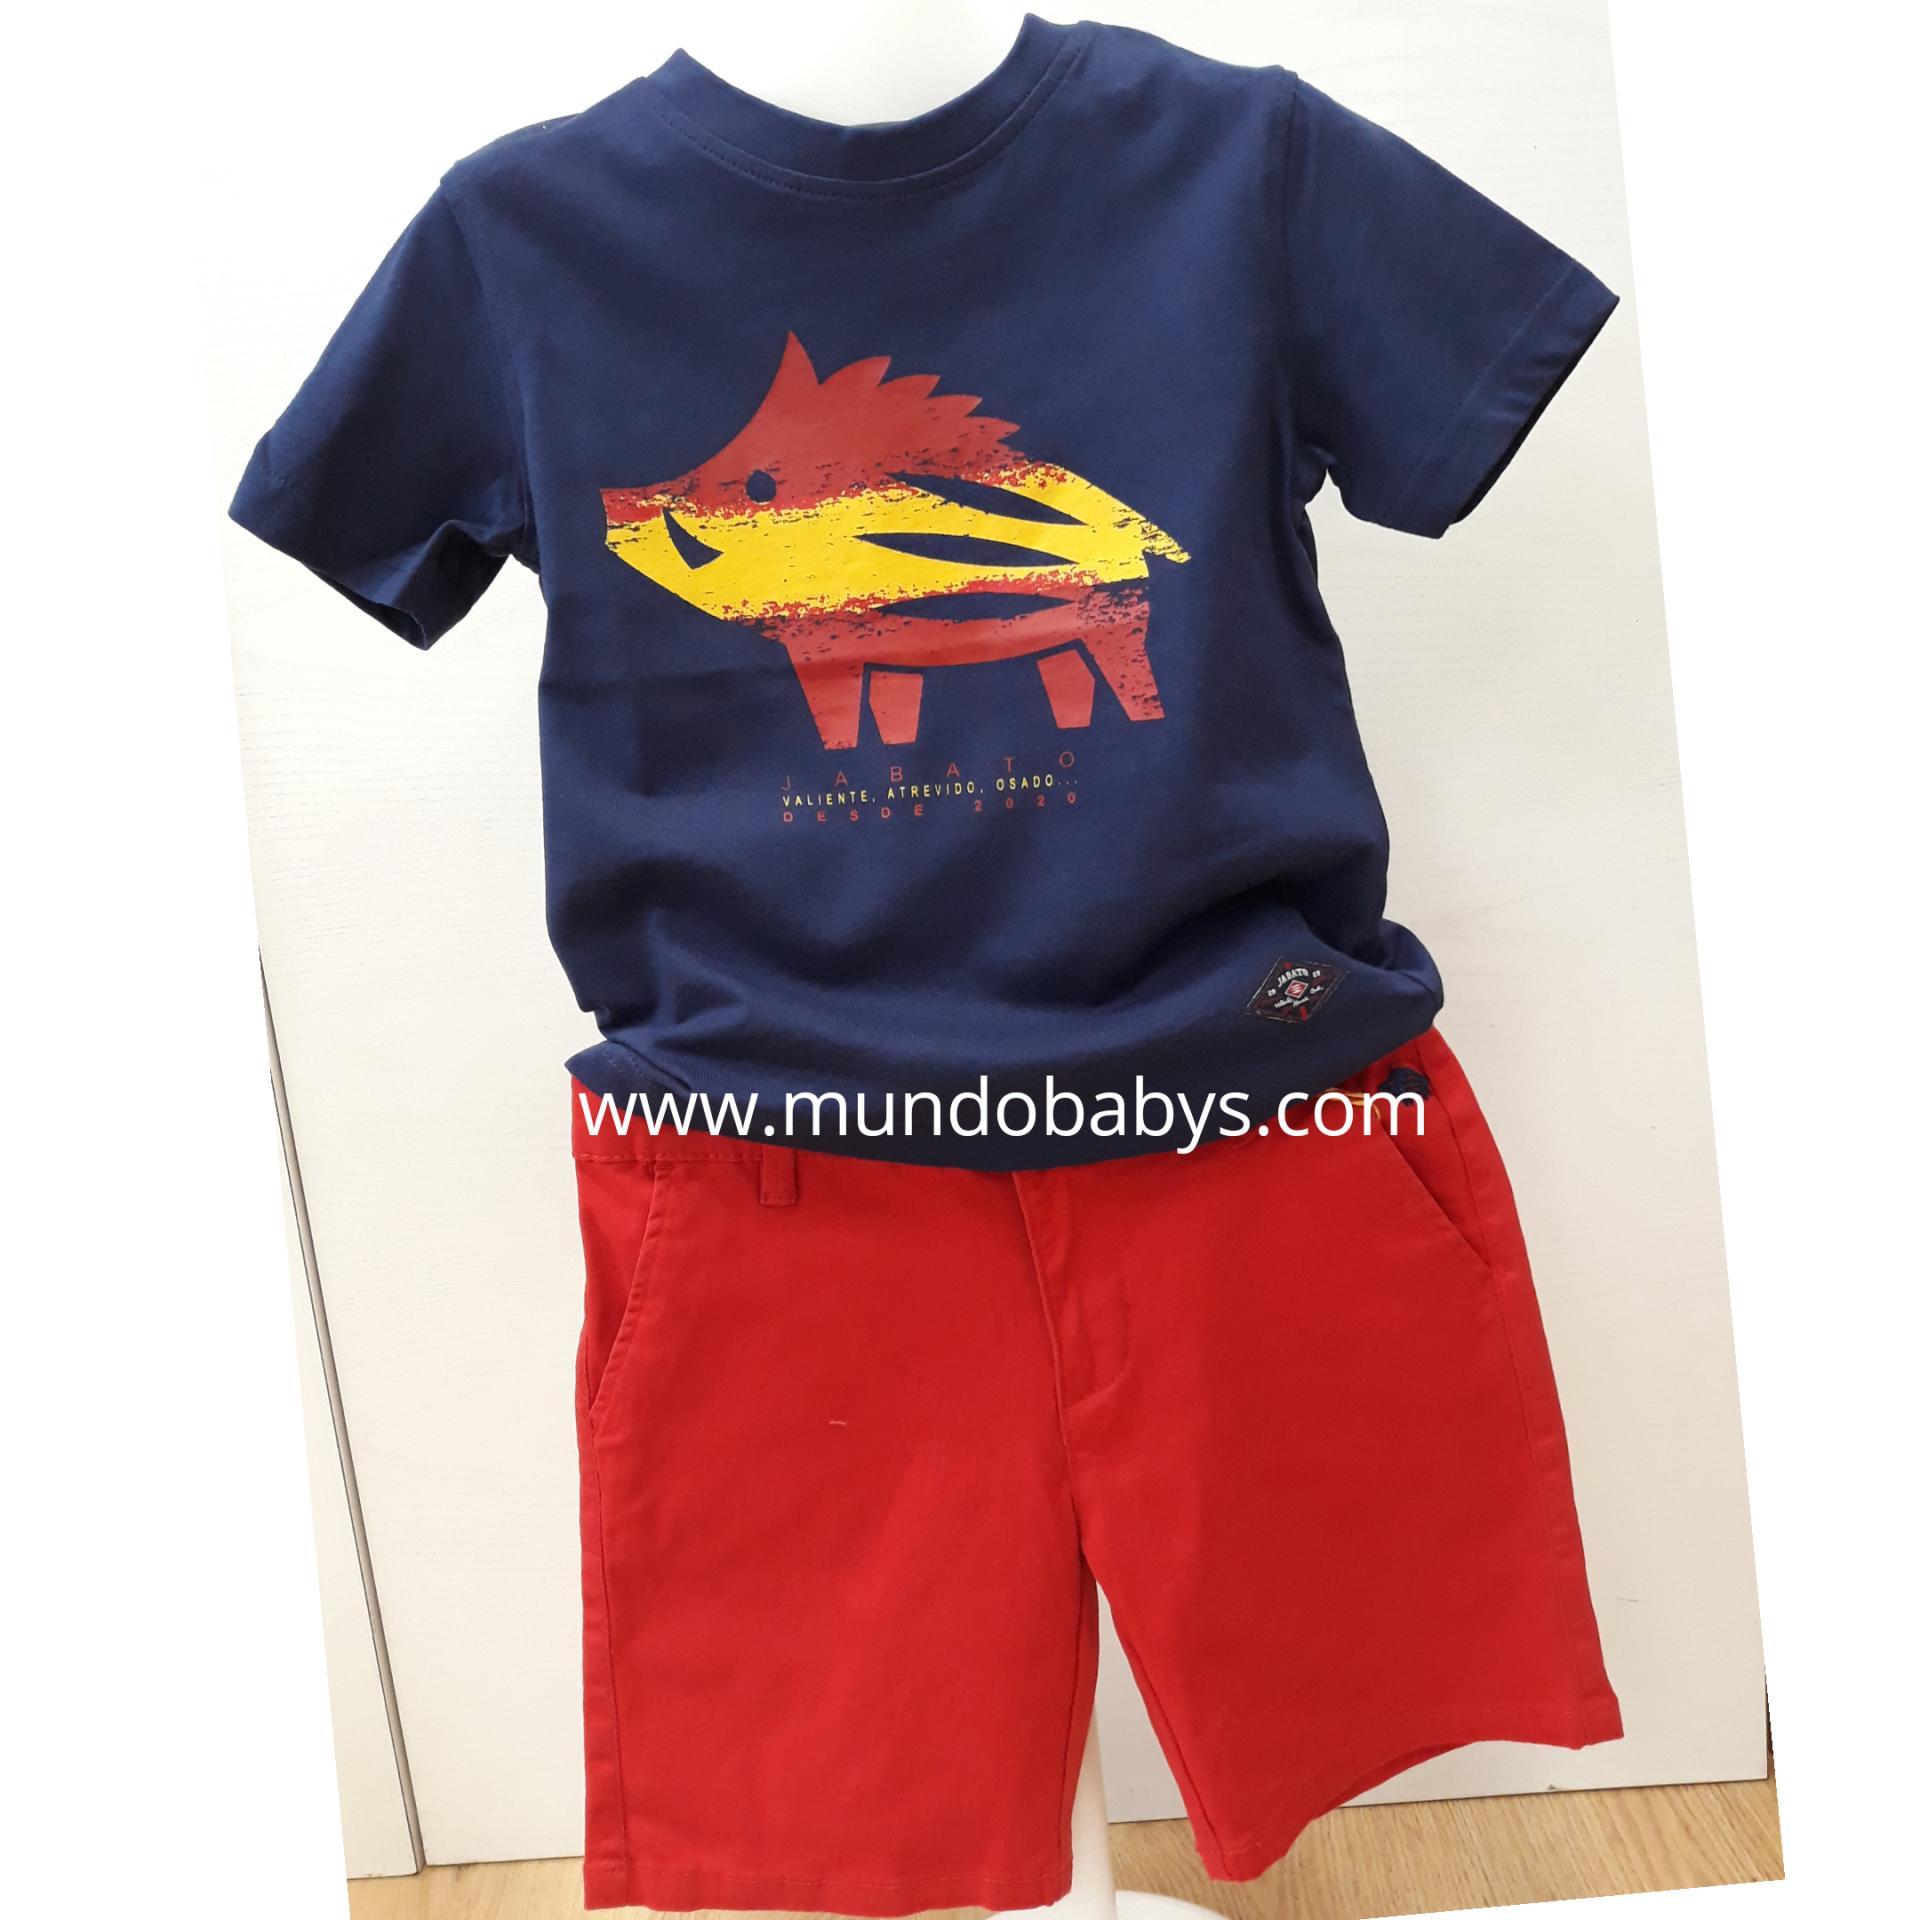 Camiseta azul marino con serigrafía en jabato